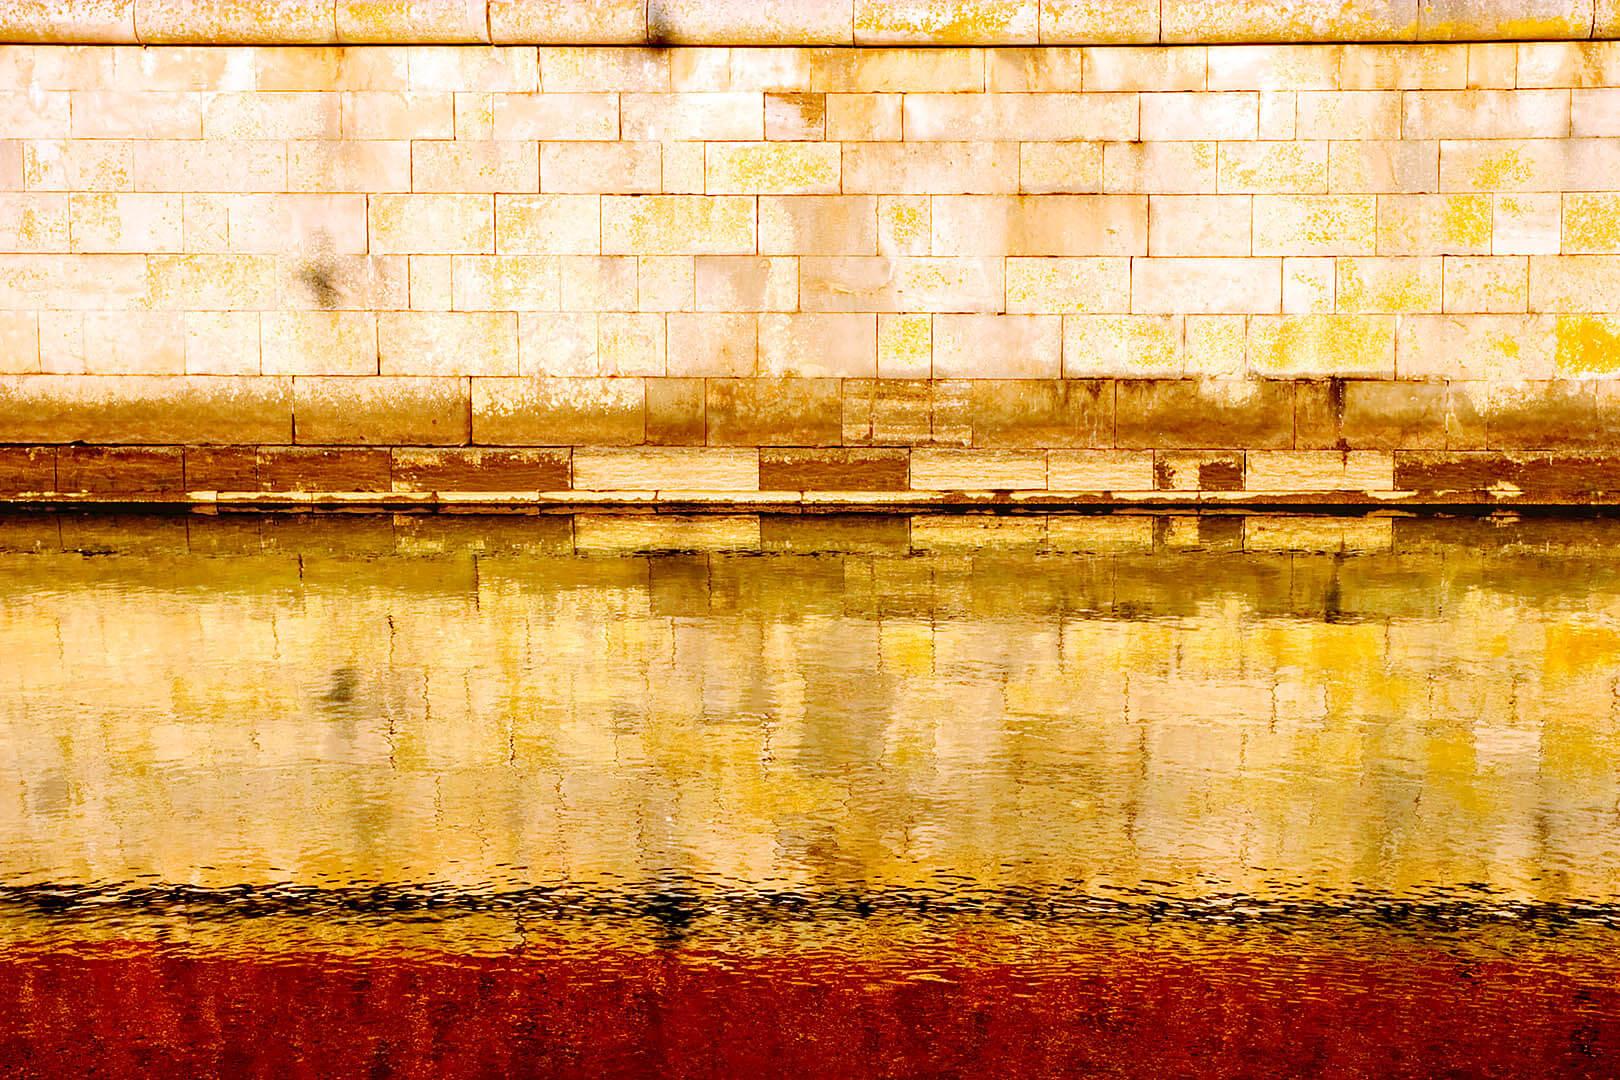 Harbor Wall Reflection